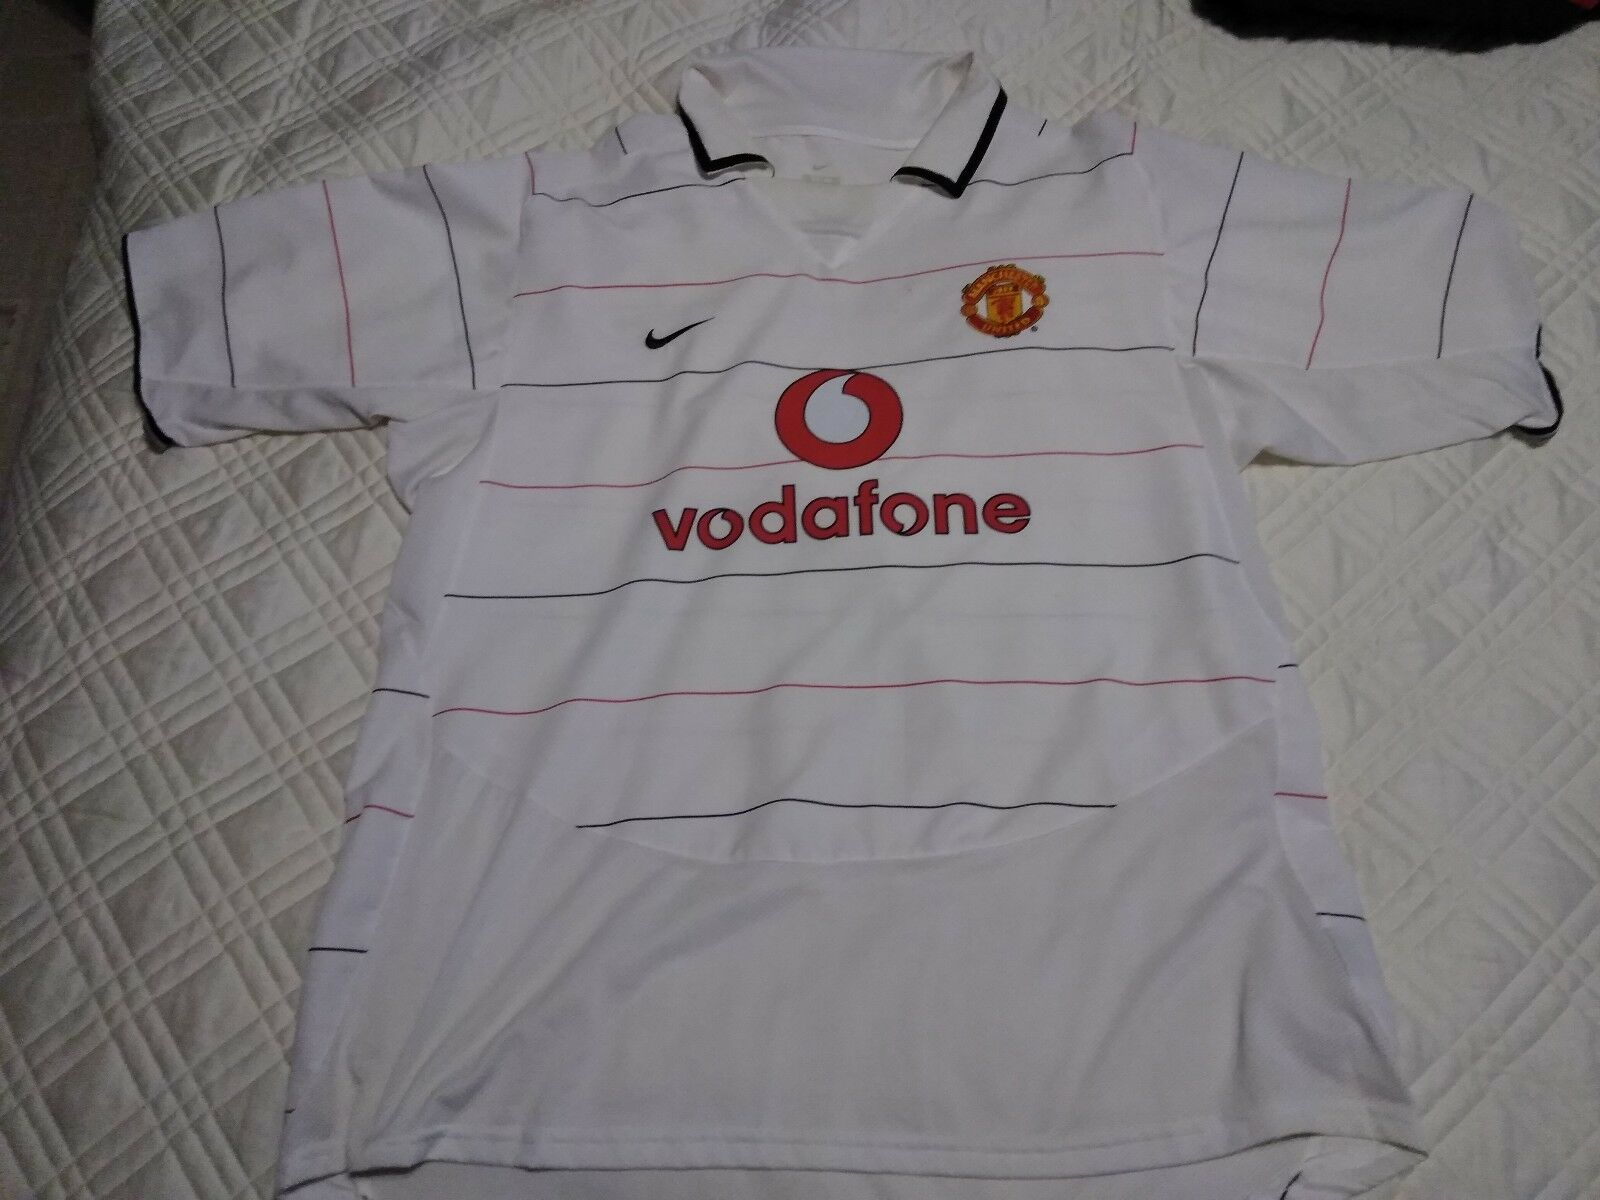 Manchester United Official Jersey Vodafone Sponsorship Premier League ManU socce